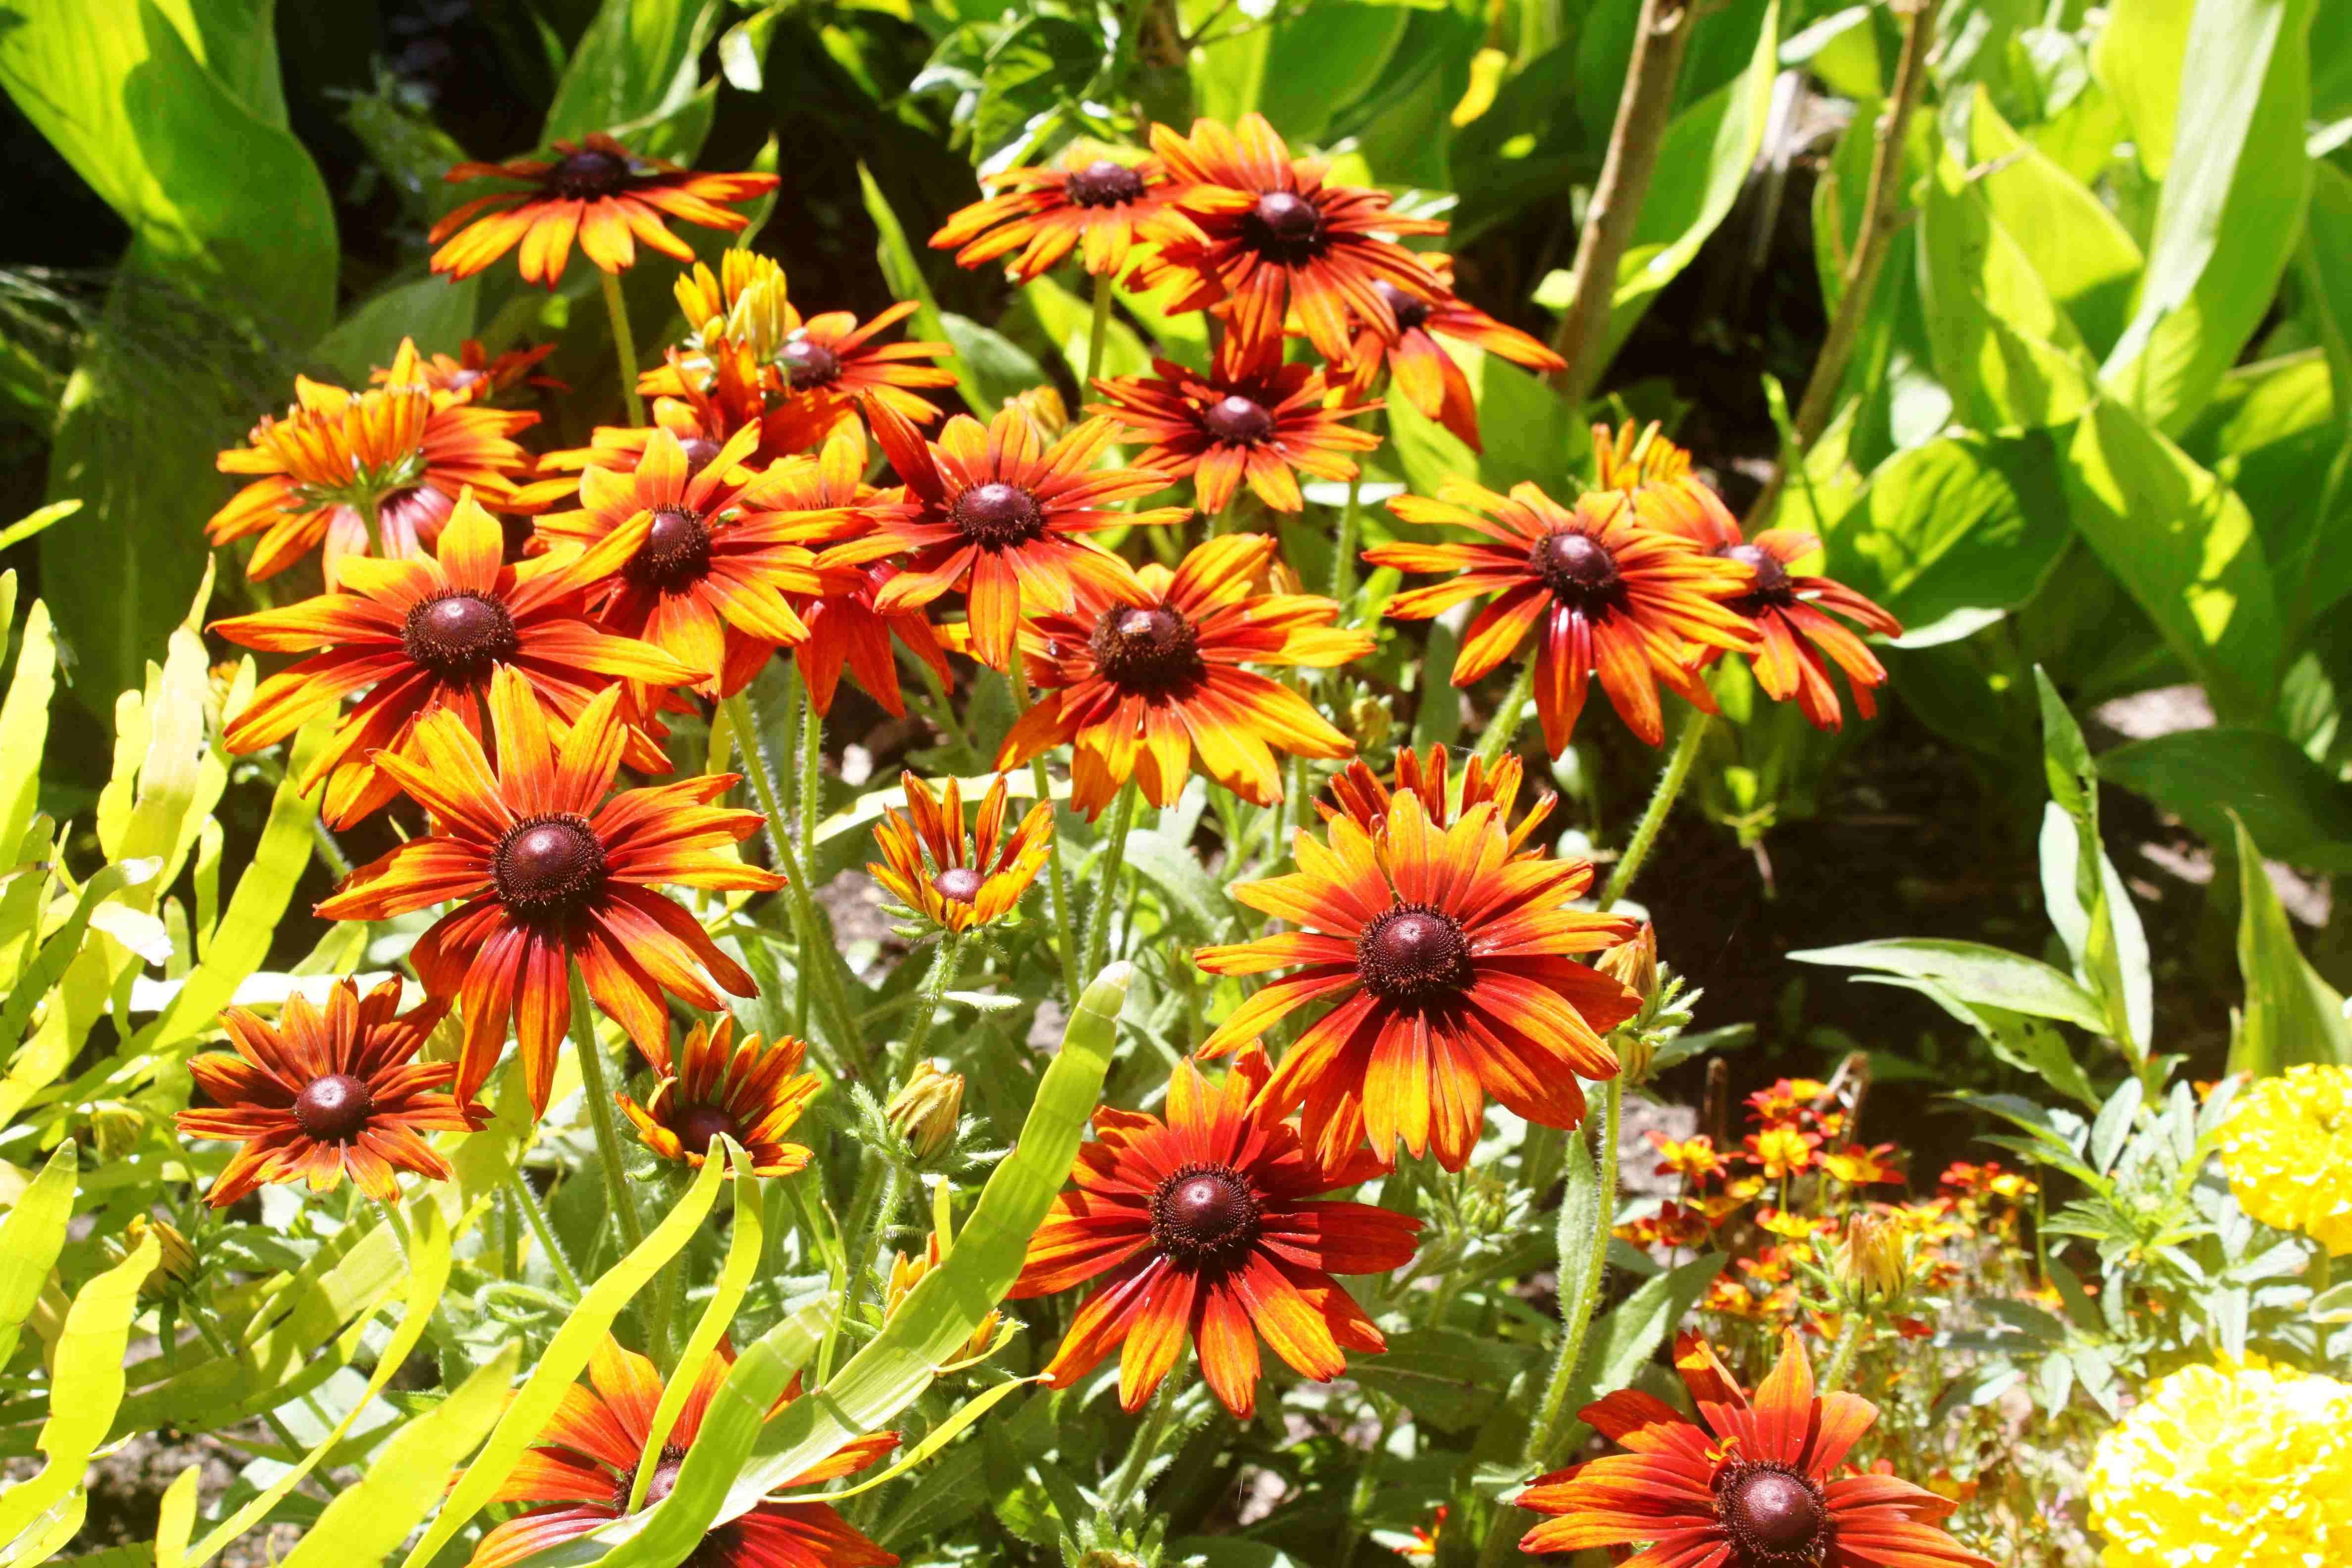 Rudbeckia-Hirta-Autumn-Colors-2Asteracees